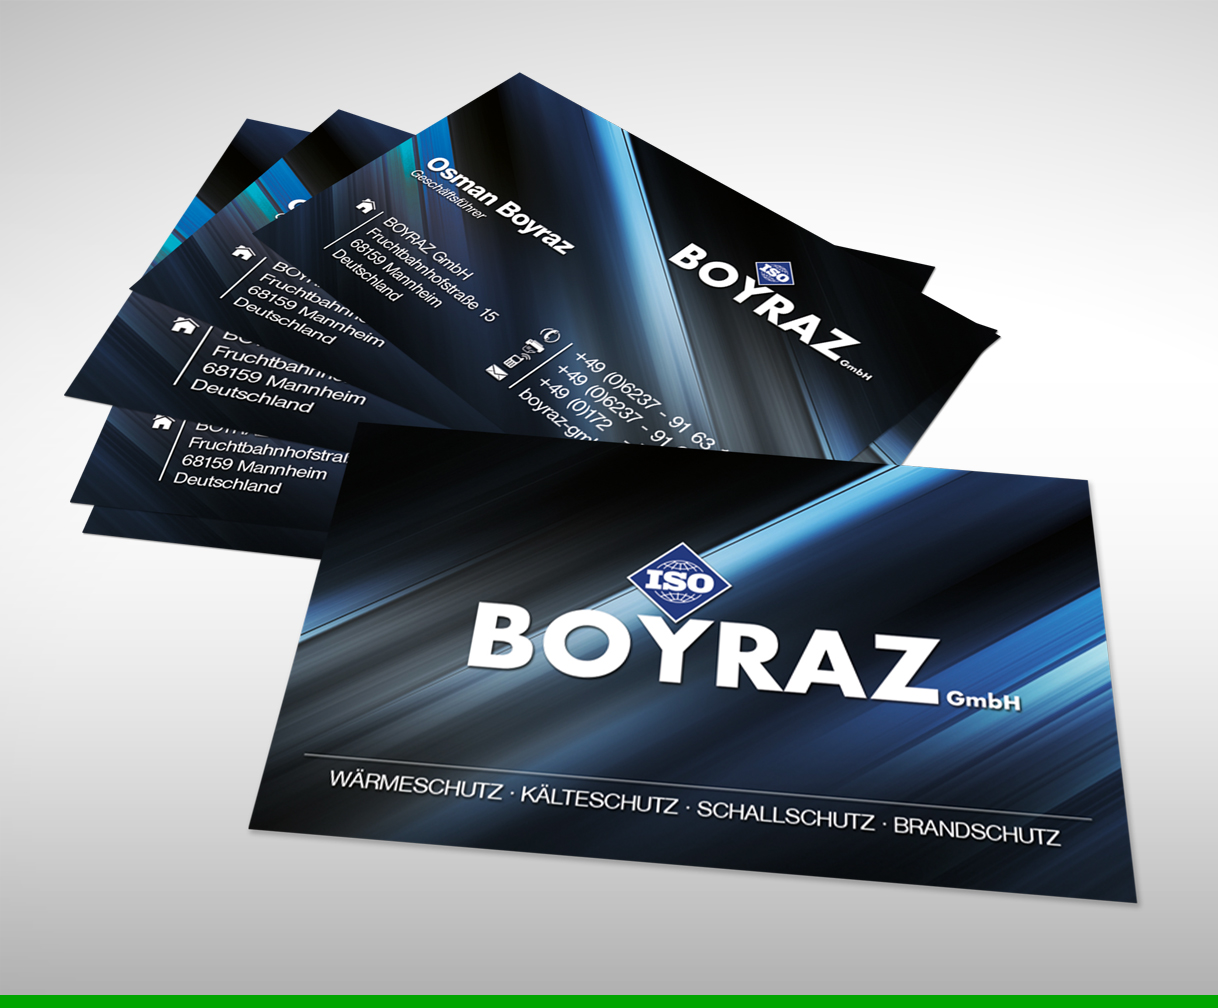 Boyraz GmbH